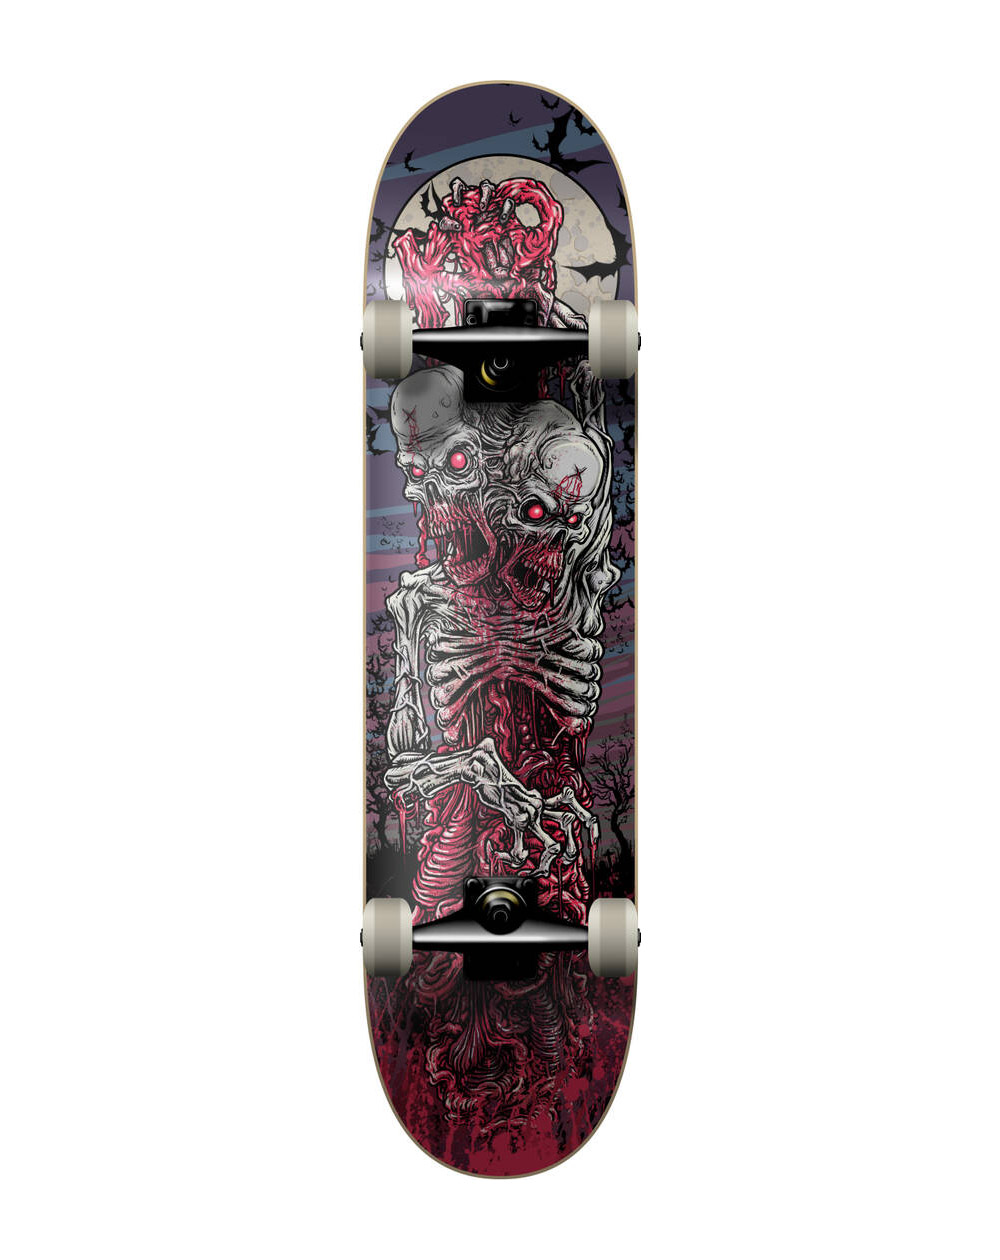 "KFD Skateboard Young Gunz 7.75"" Two Headed Zombie"